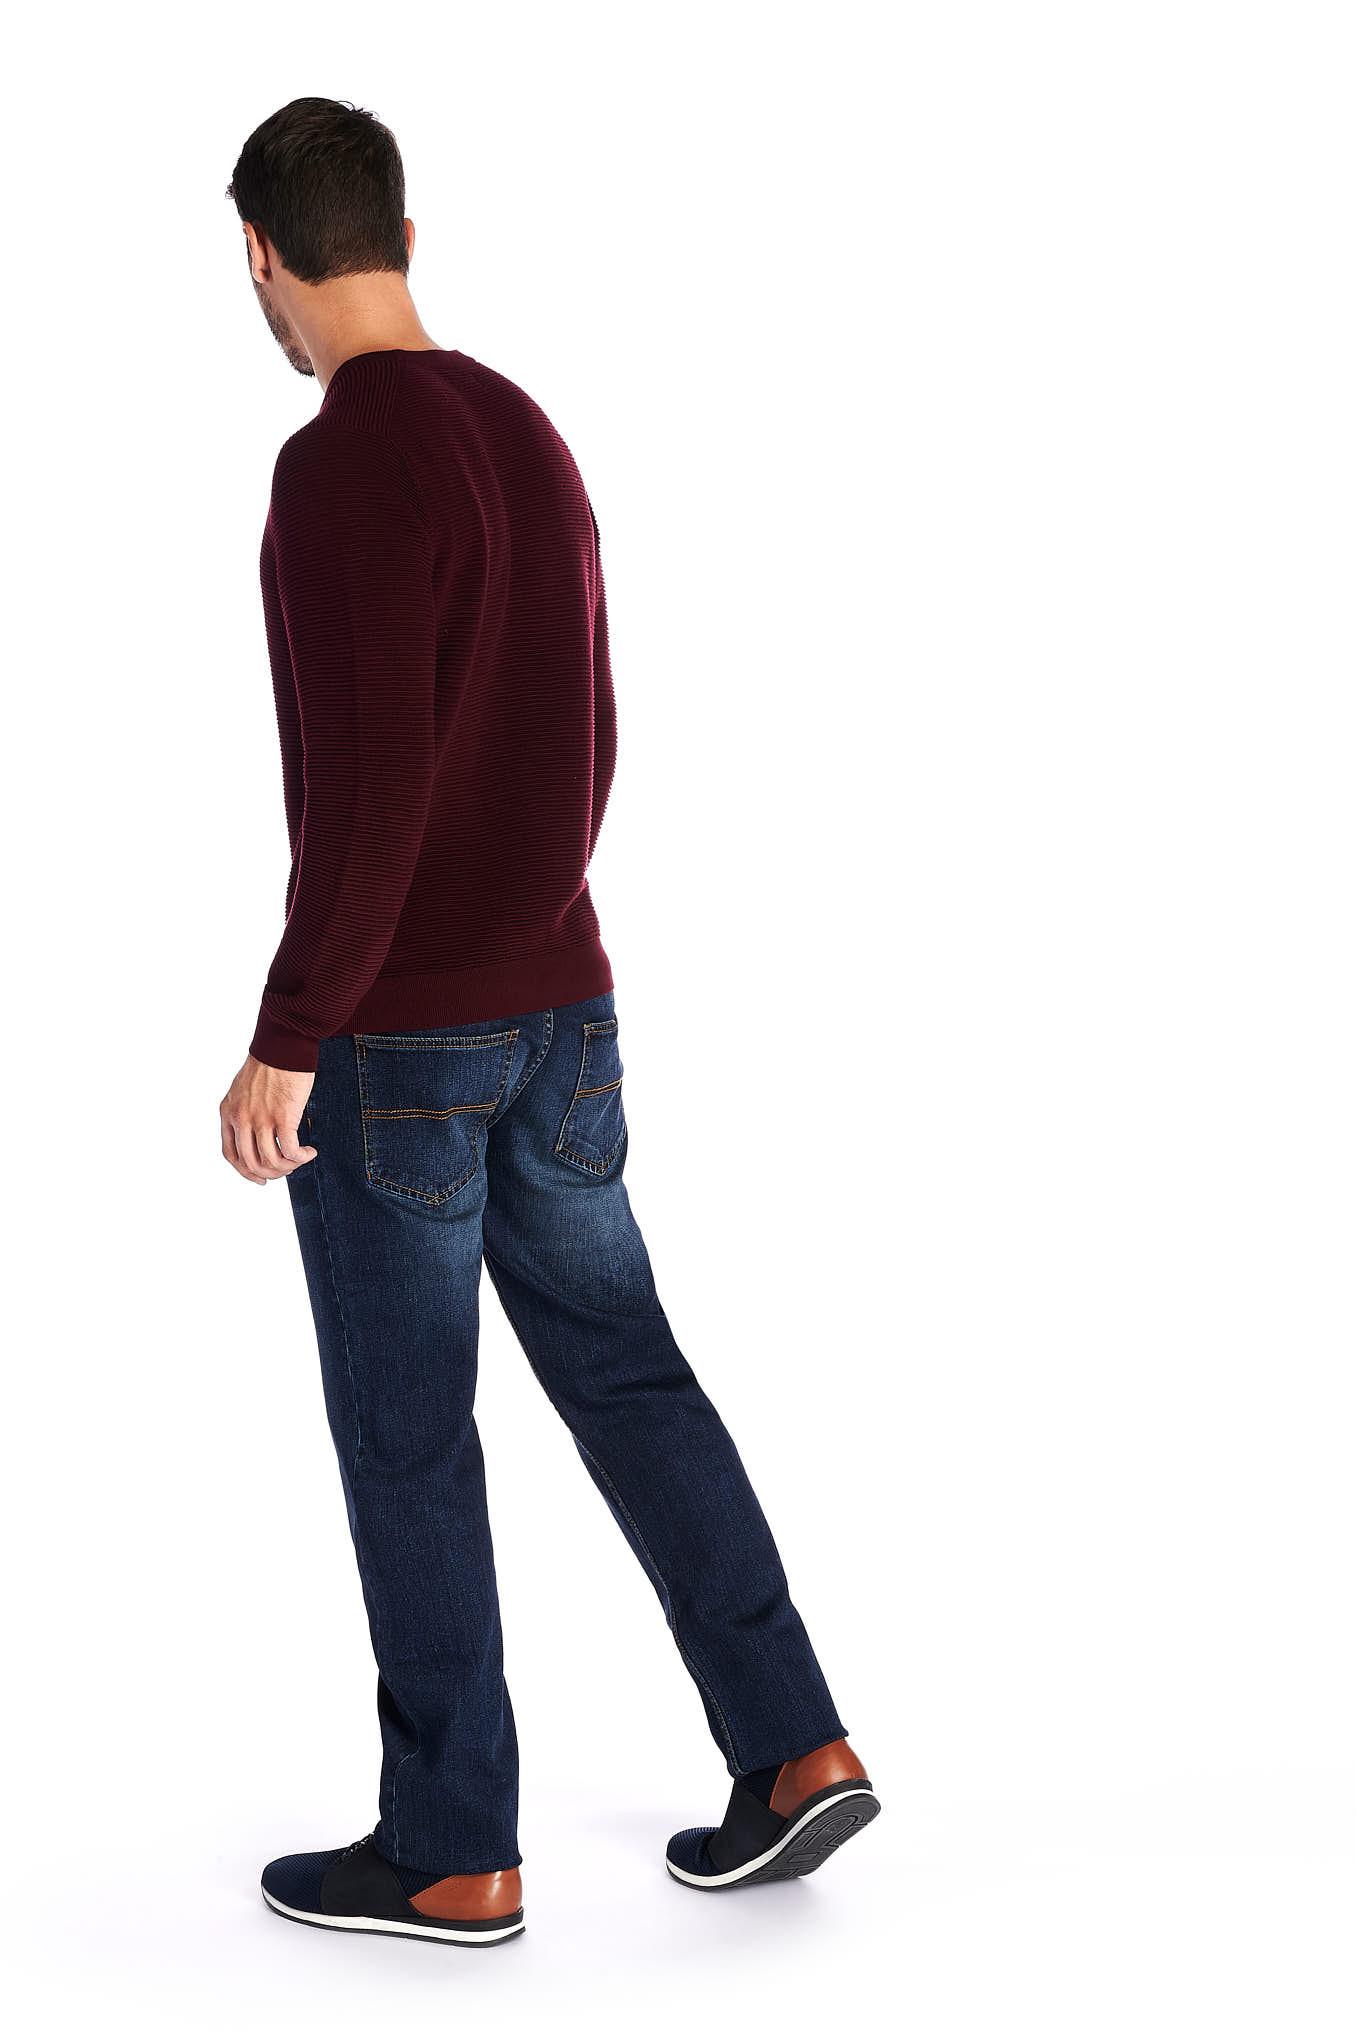 Sweater Plum Casual Man